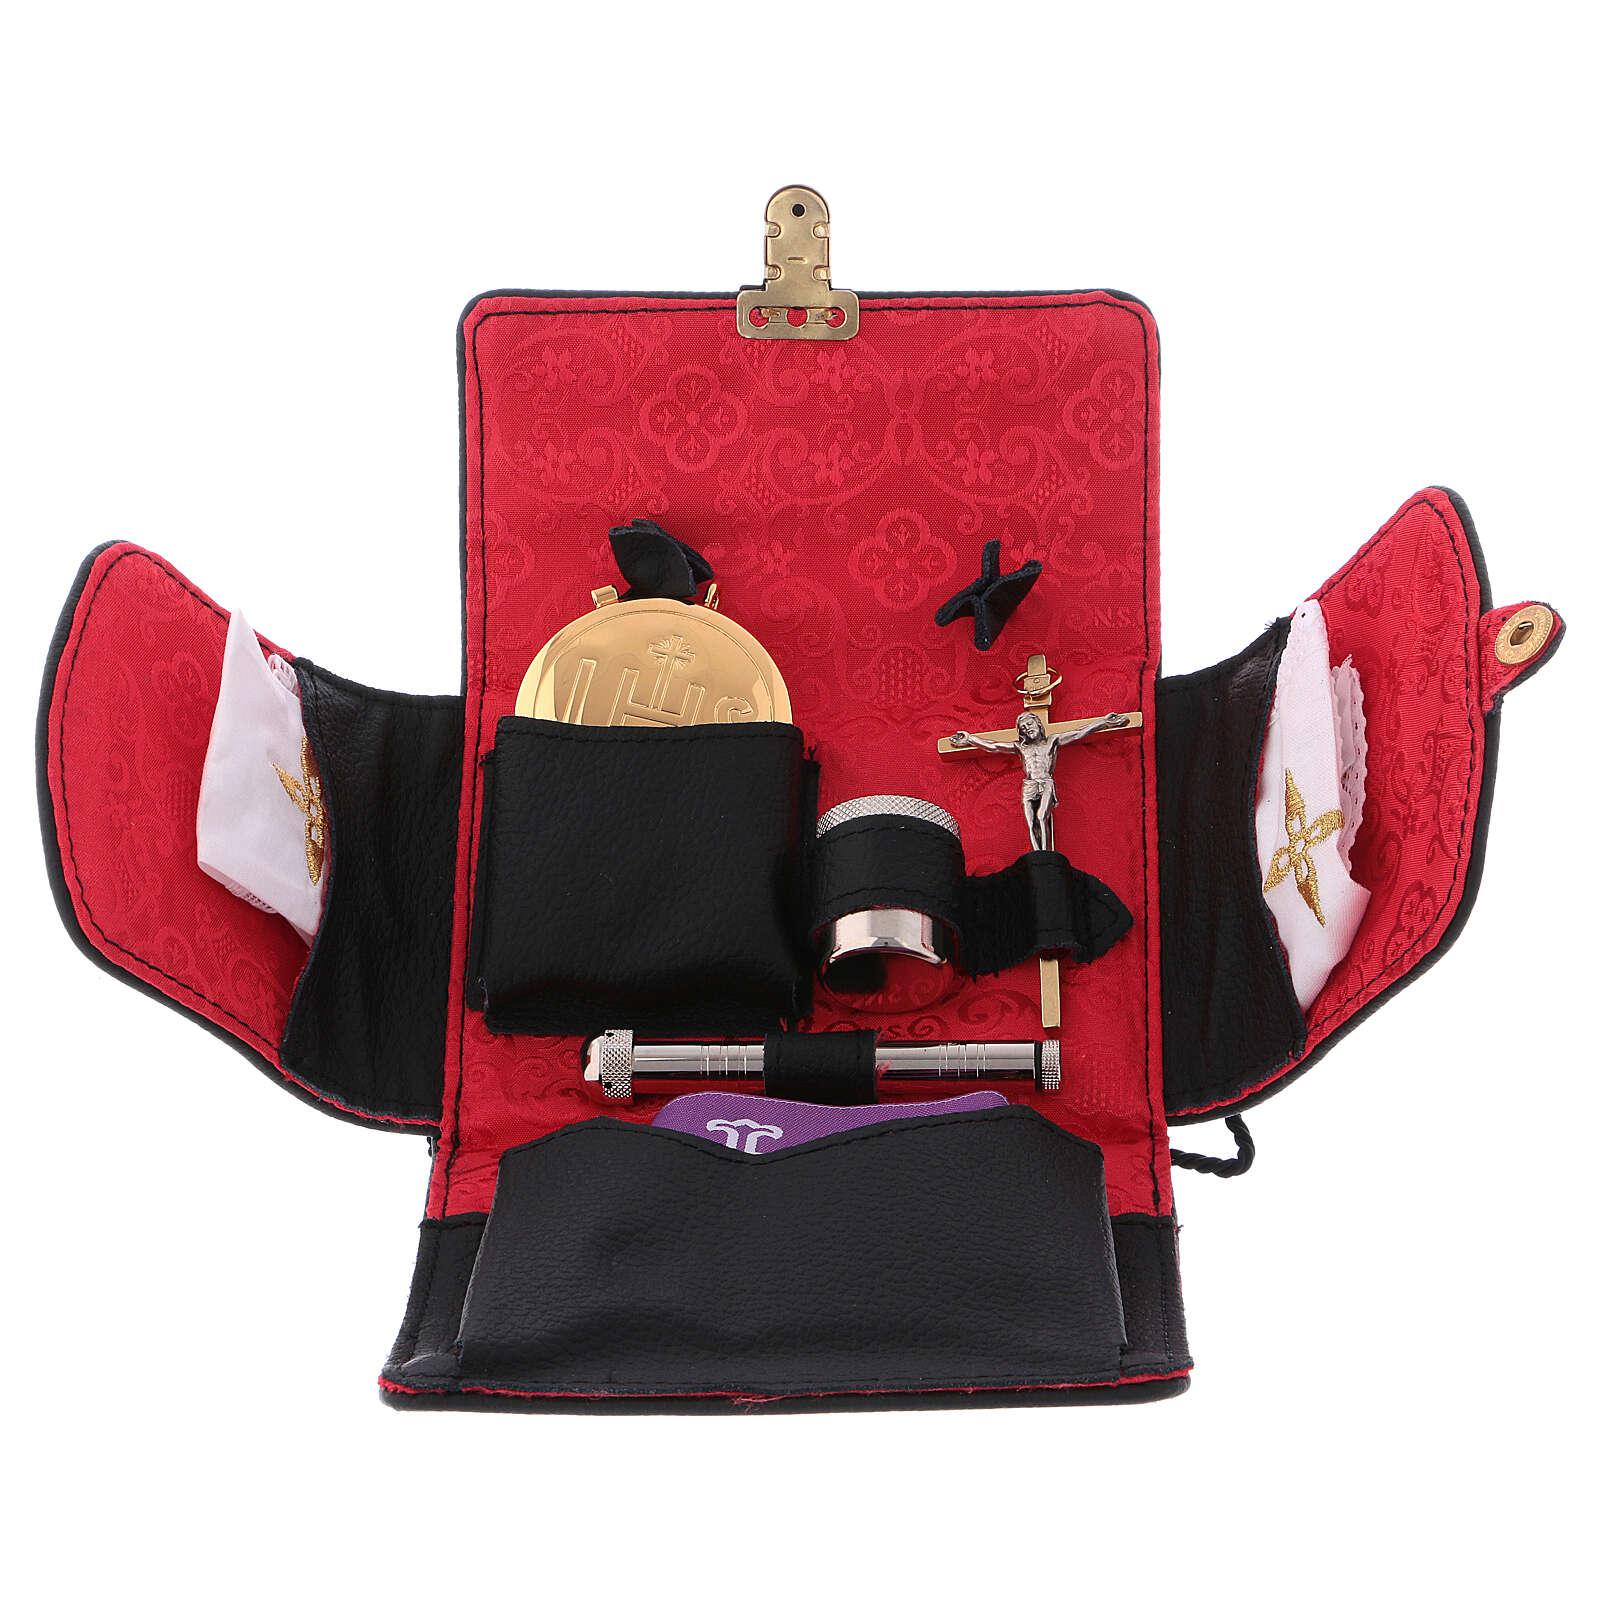 Pyx set with black leather case, snap closure and shoulder strap 3